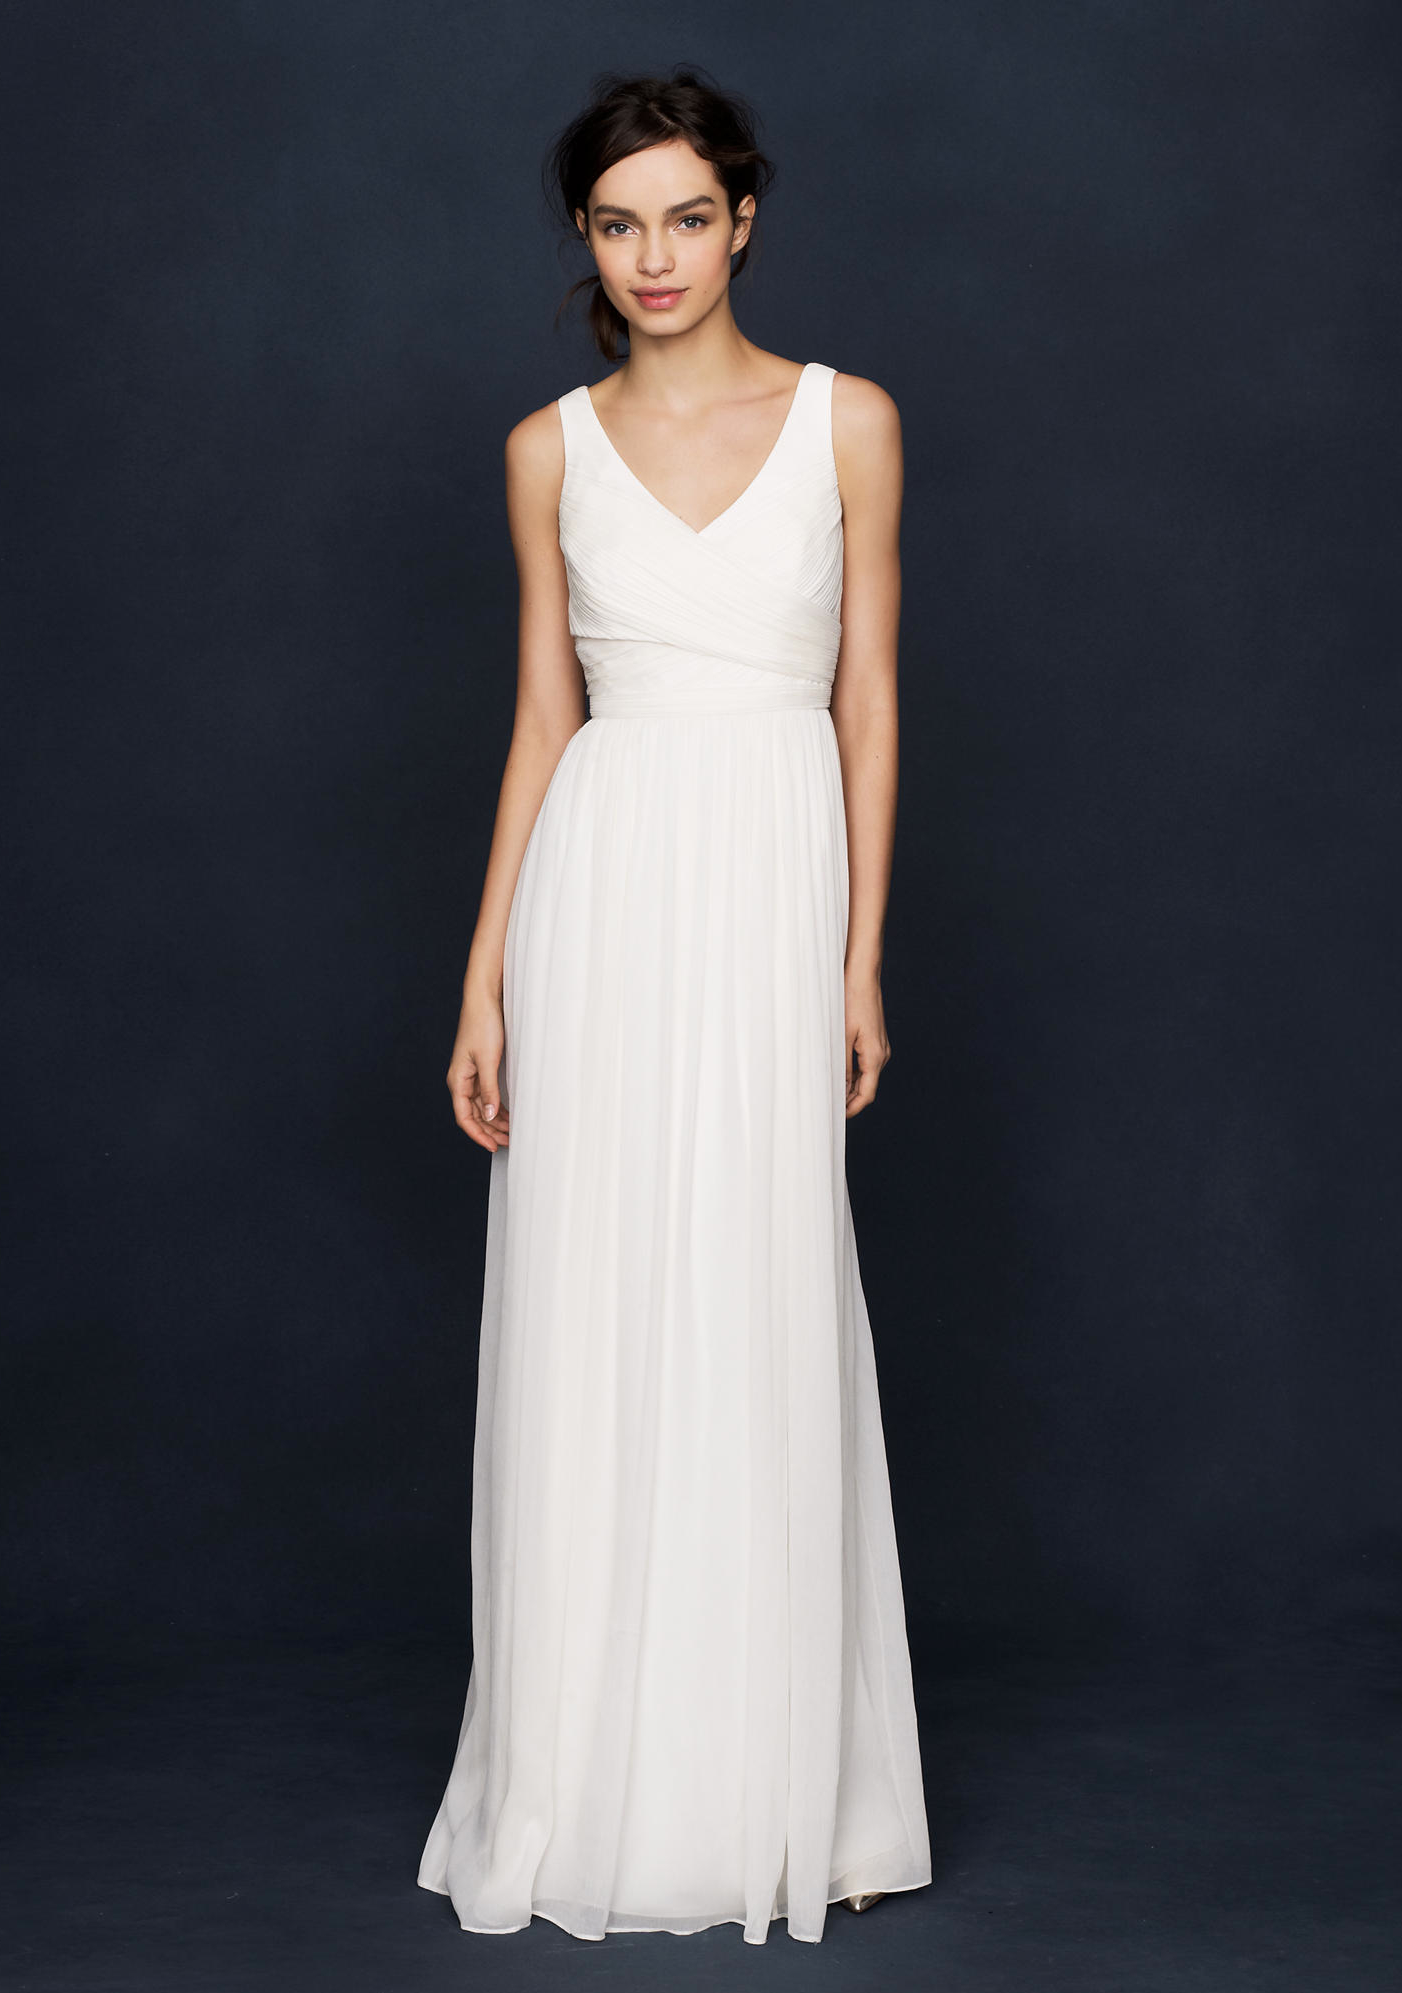 petite wedding dresses uk us wedding dresses for petite Petite wedding dresses J Crew